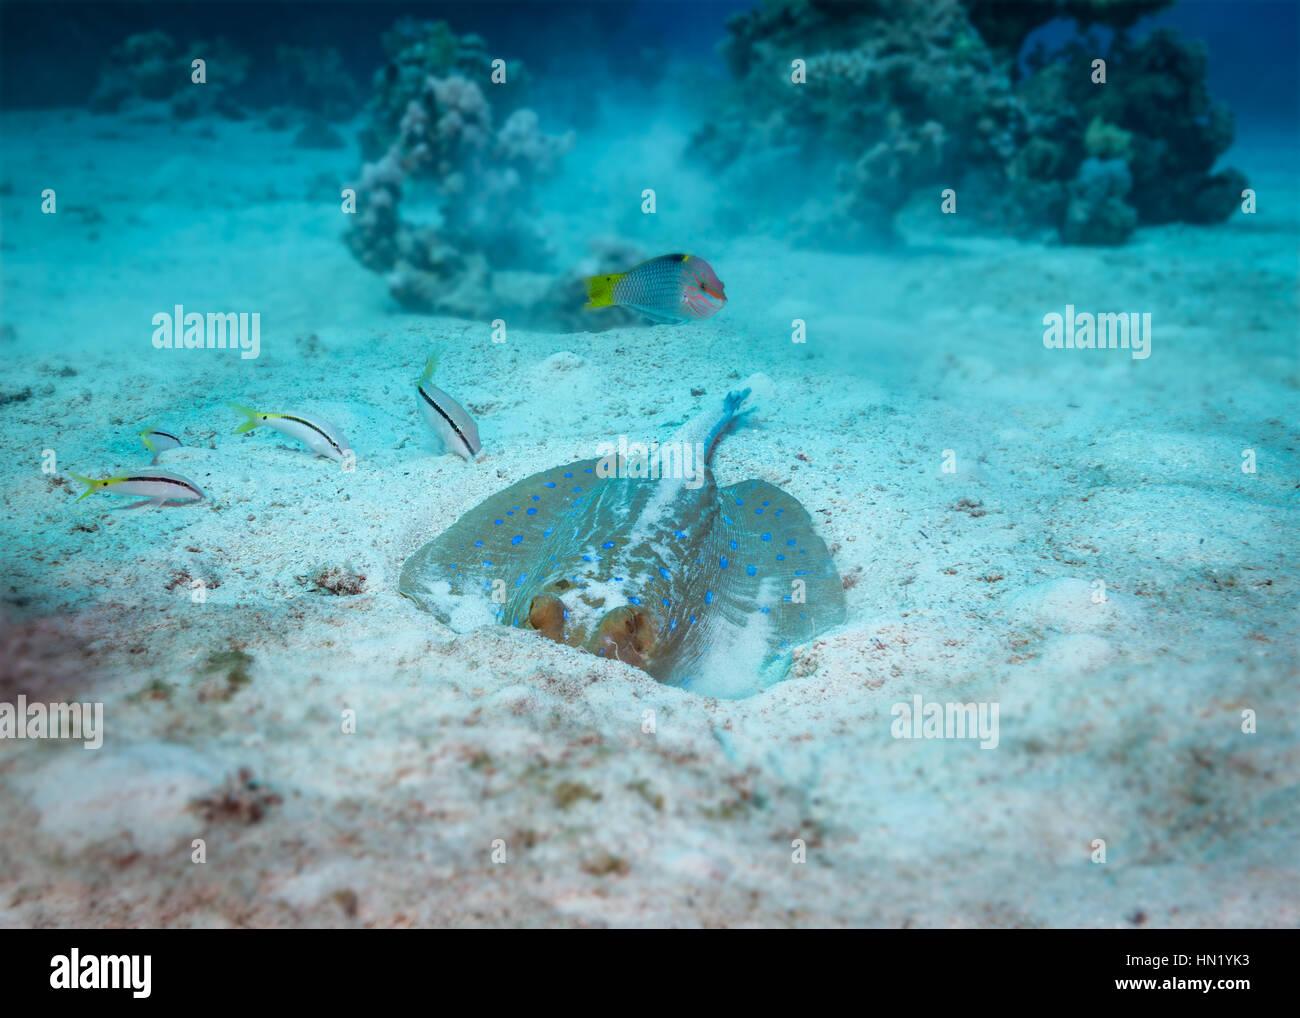 Blue spotted stingray (Taeniura lymma) underwater behaviour. Feeding with chequerboard wrasse (Halichoeres hortulanus) - Stock Image